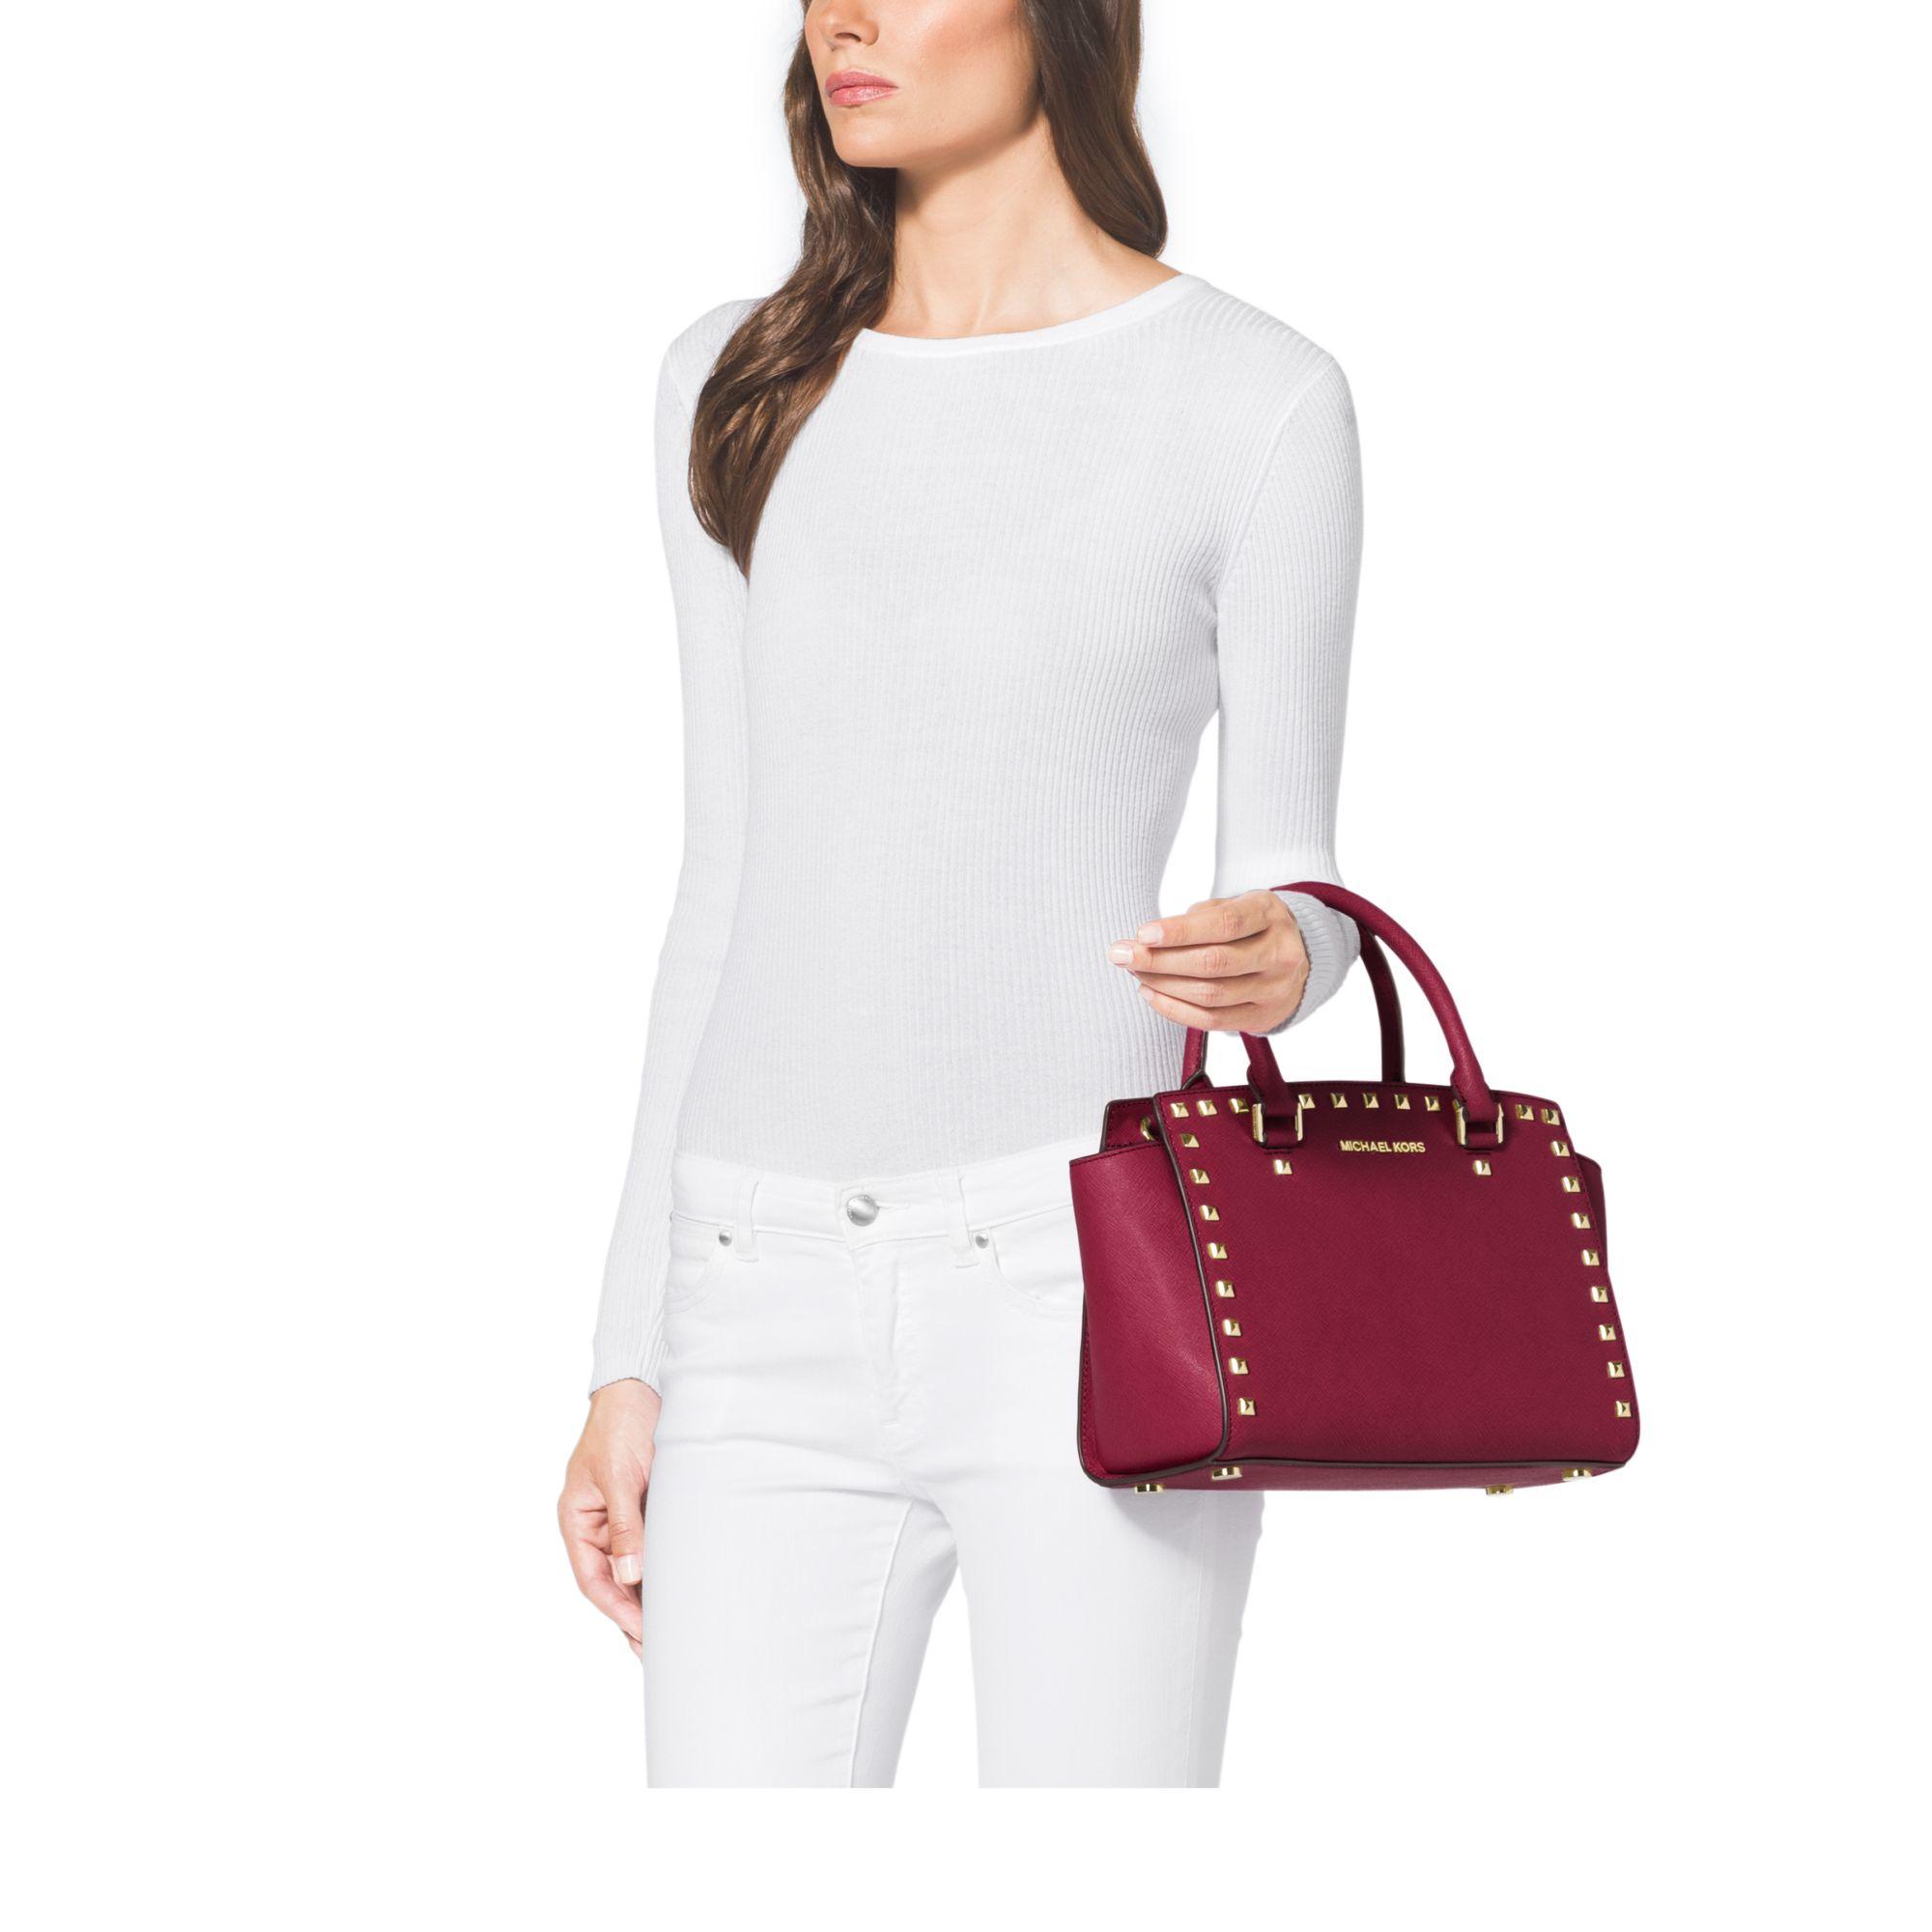 michael kors selma studded saffiano leather satchel in red. Black Bedroom Furniture Sets. Home Design Ideas